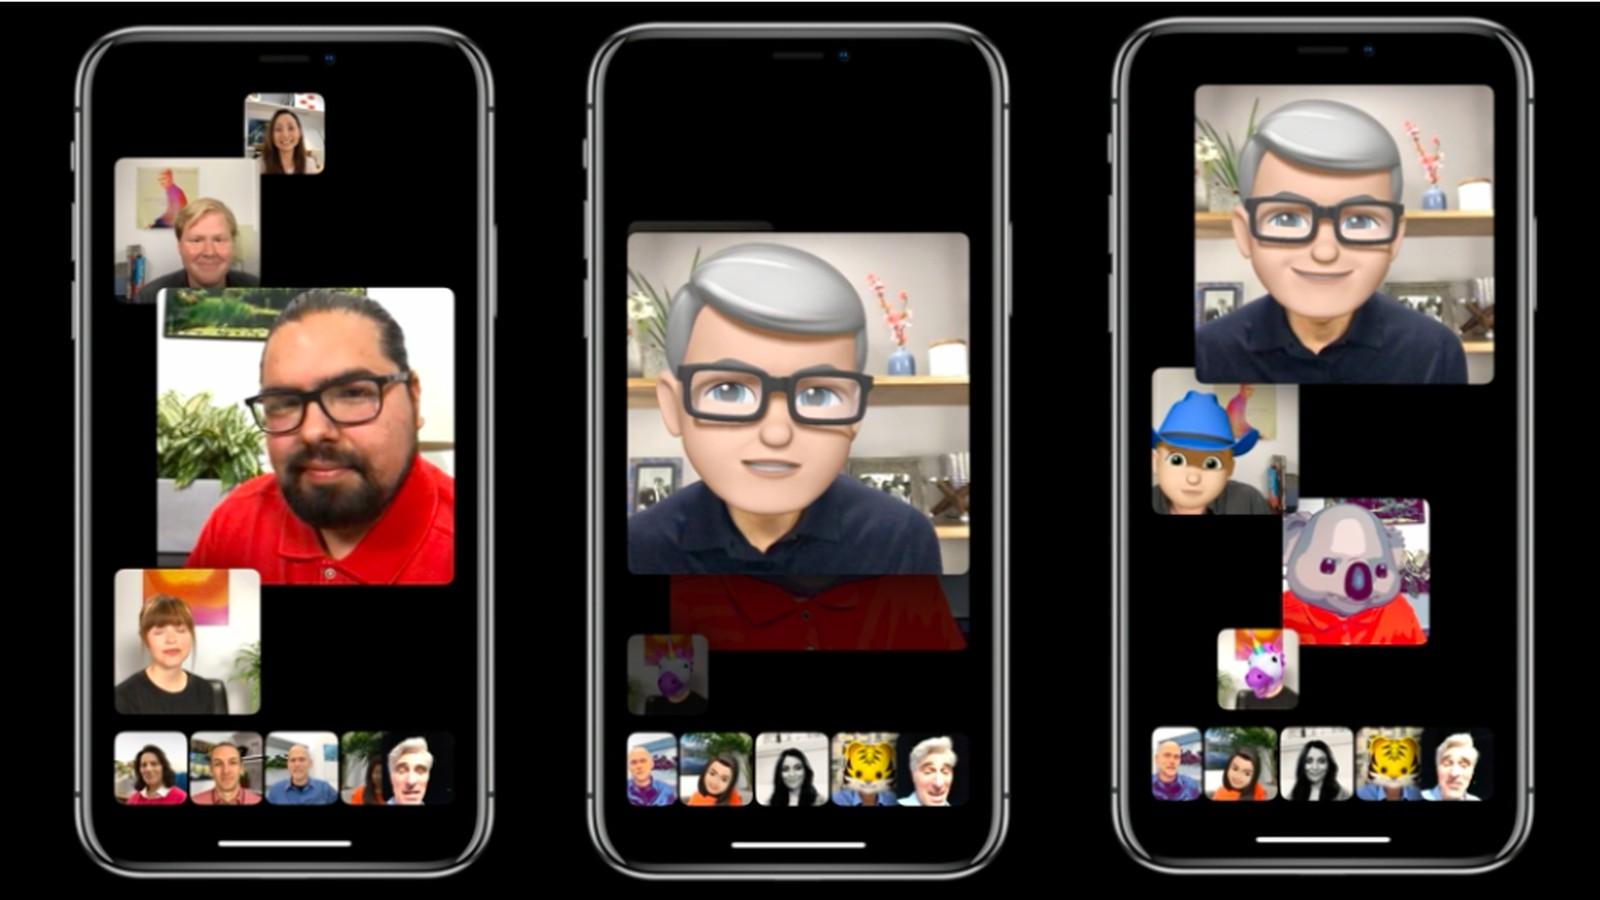 Nueva York investigará a Apple por fallo en aplicación